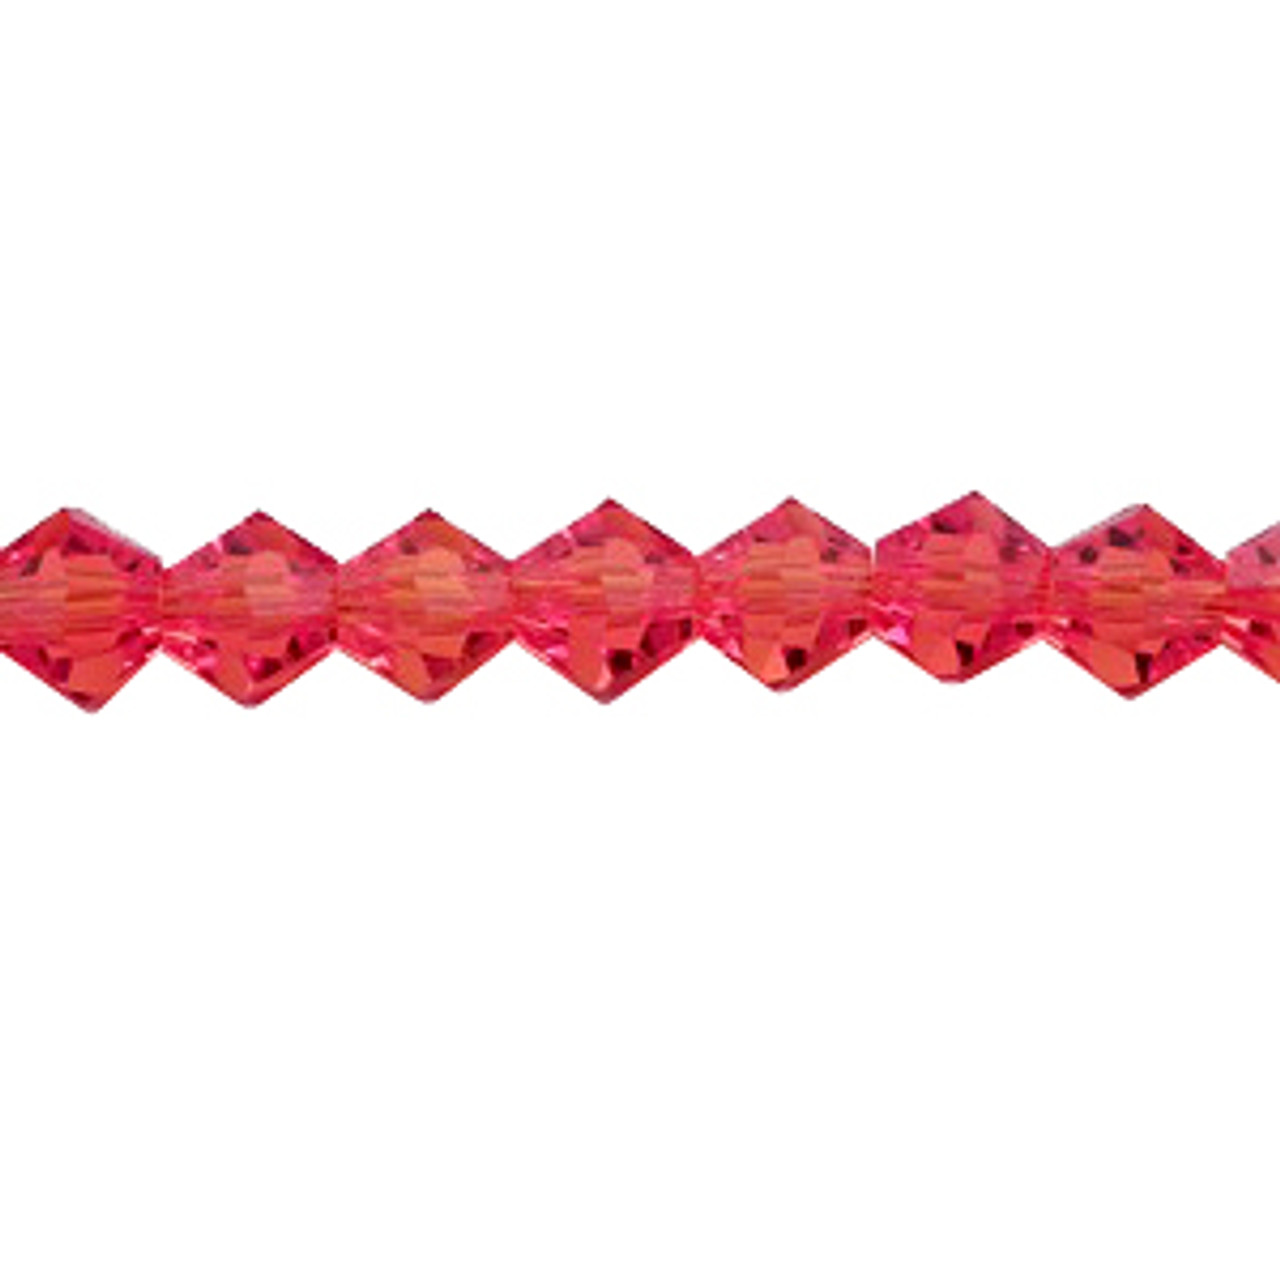 4mm Red Thunder Polish Crystal Bicones  - 144pk - 4BI12